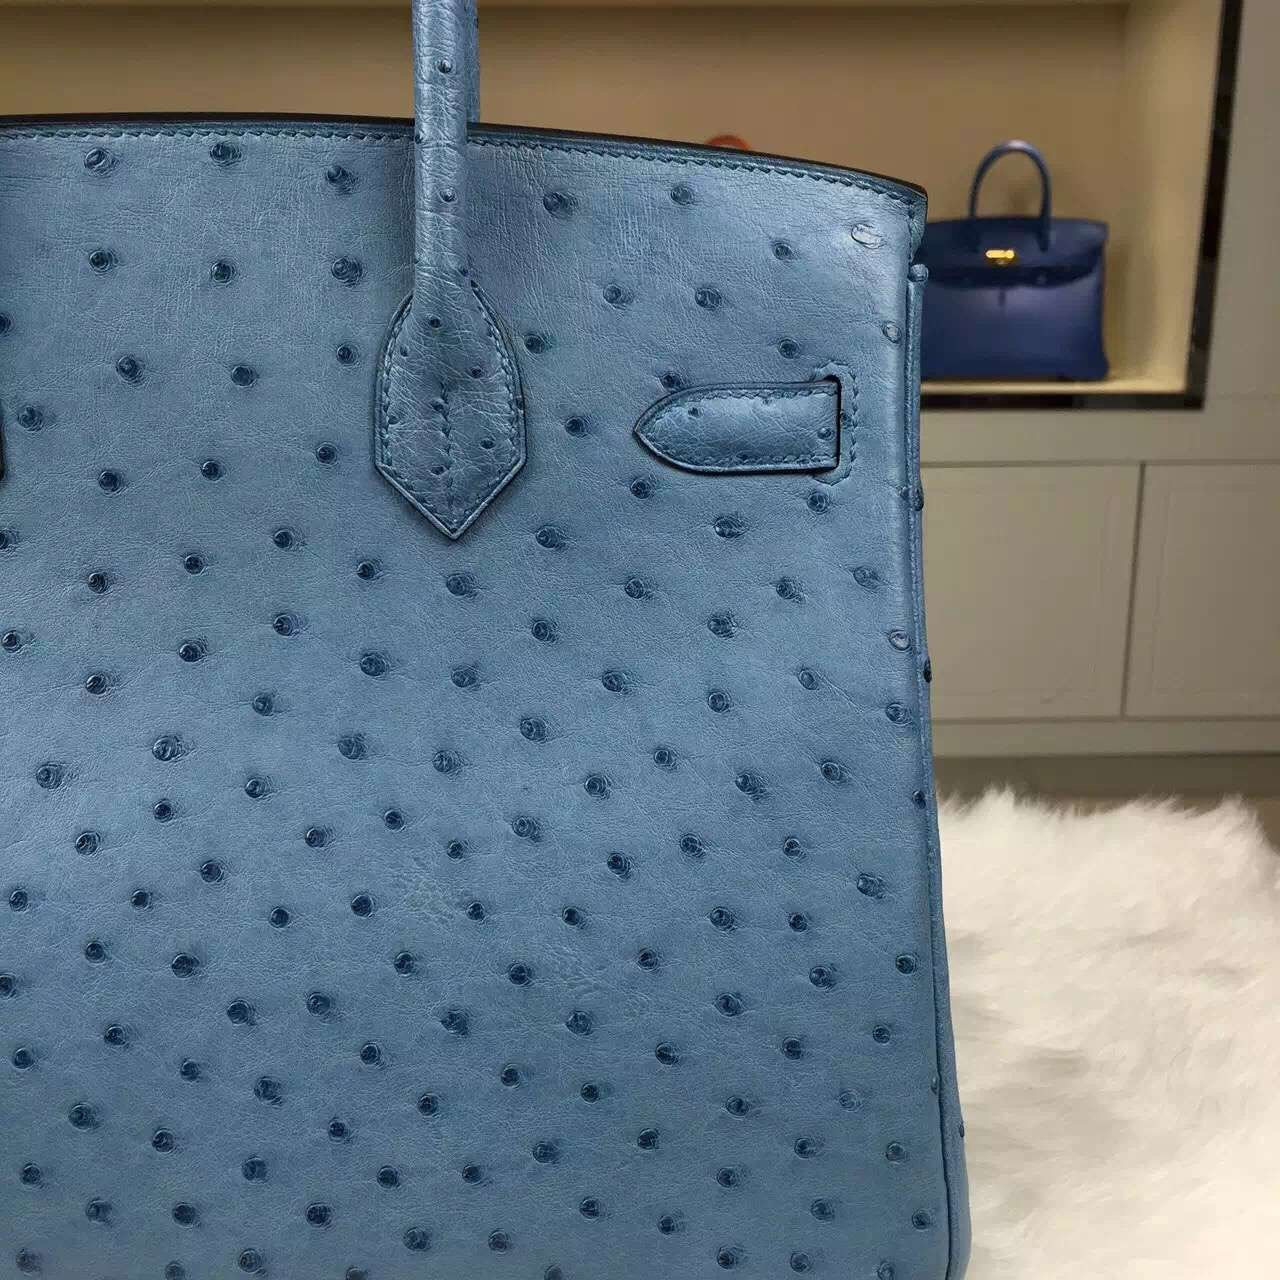 Online Store Hermes Birkin30 Bright Blue Ostrich Leather Tote Bag